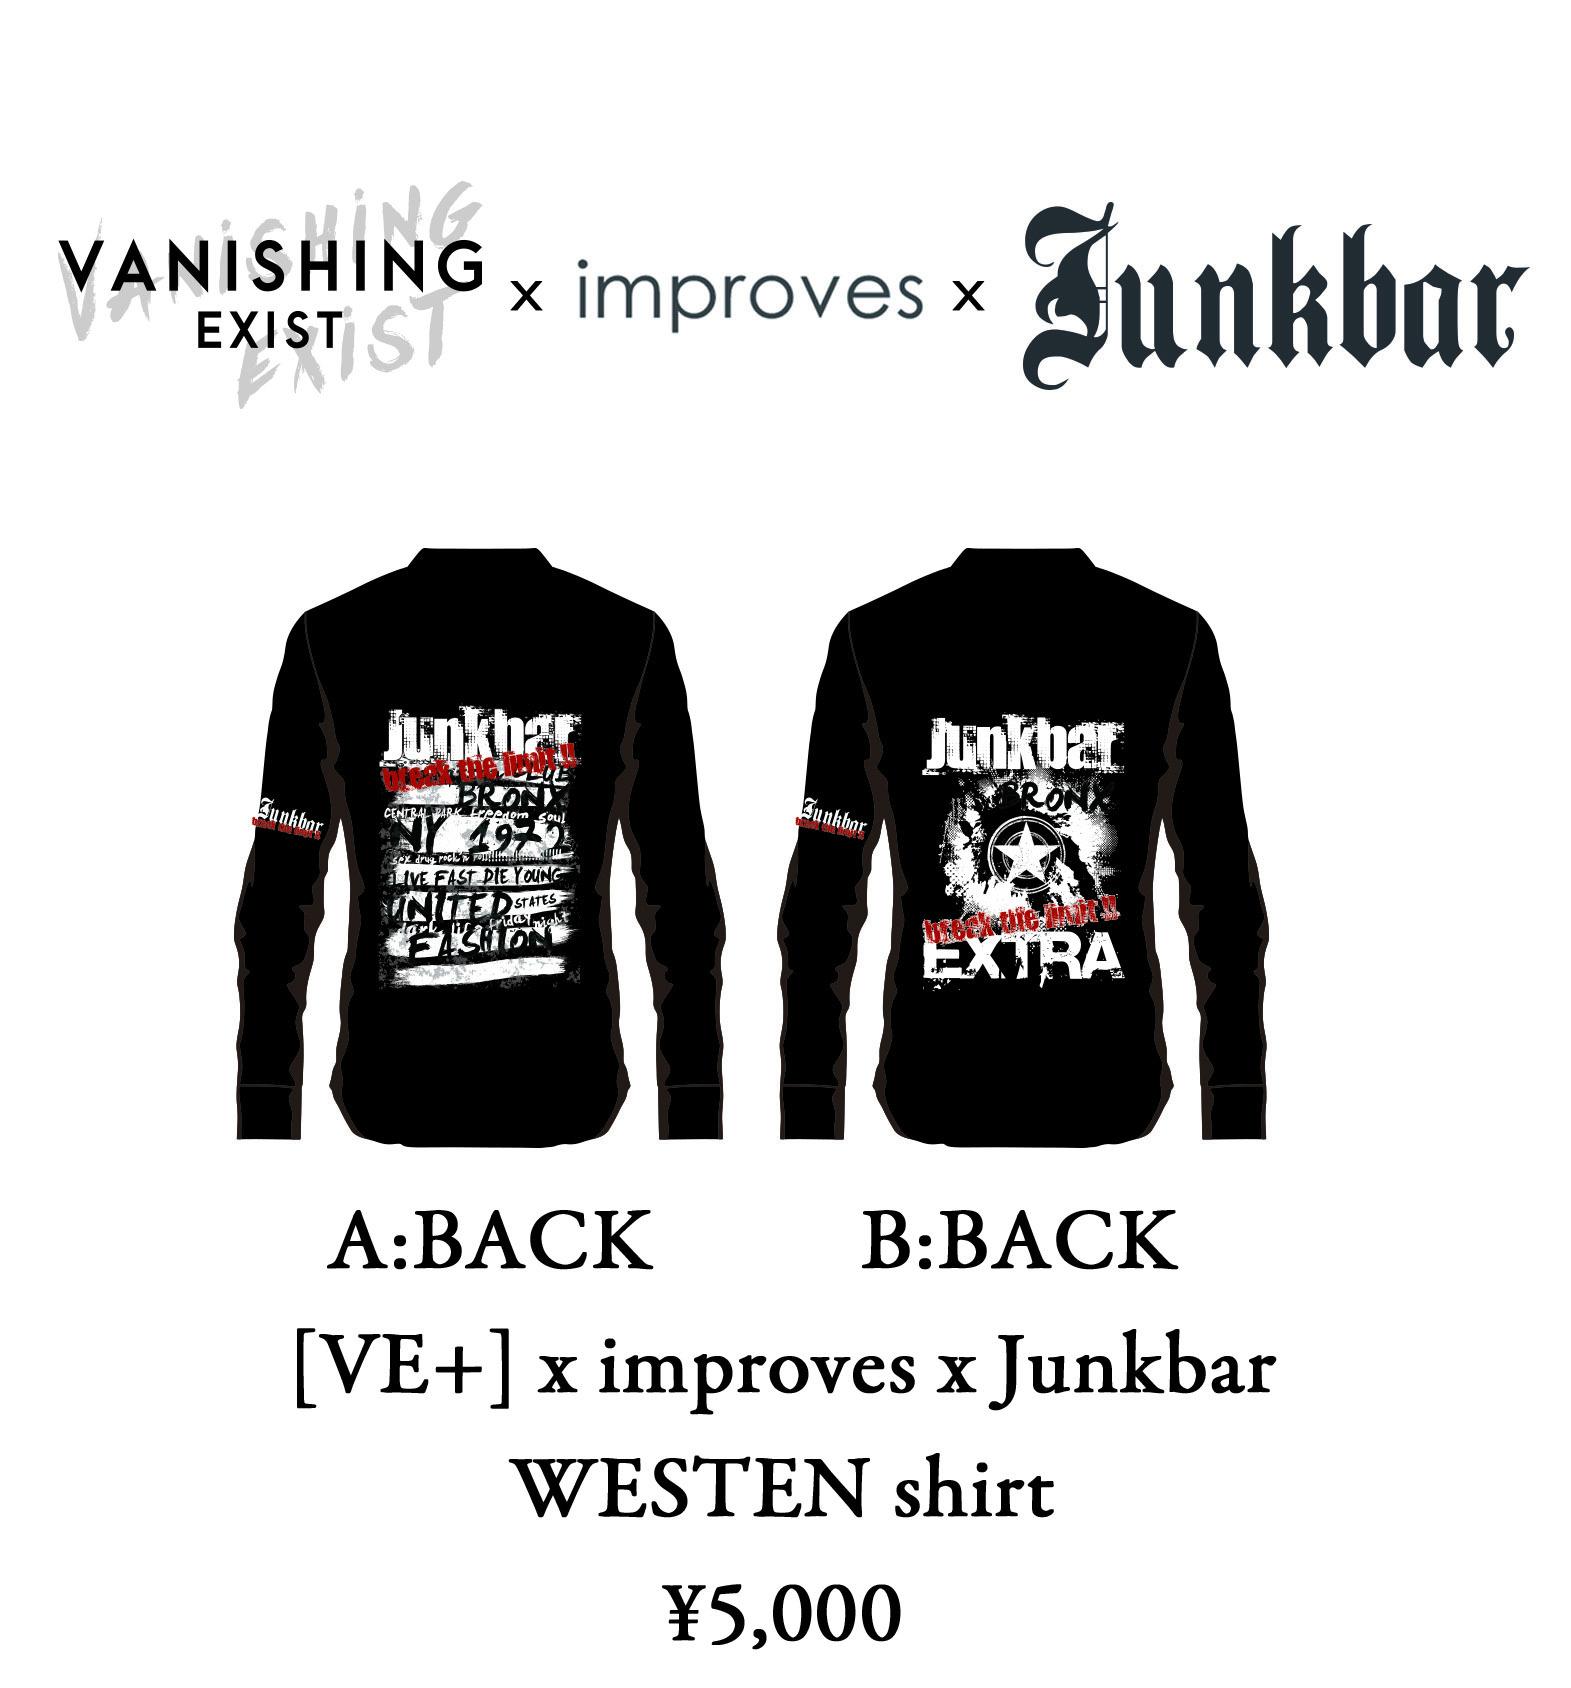 [VE+] x improves x Junkbar ウエスタンシャツ